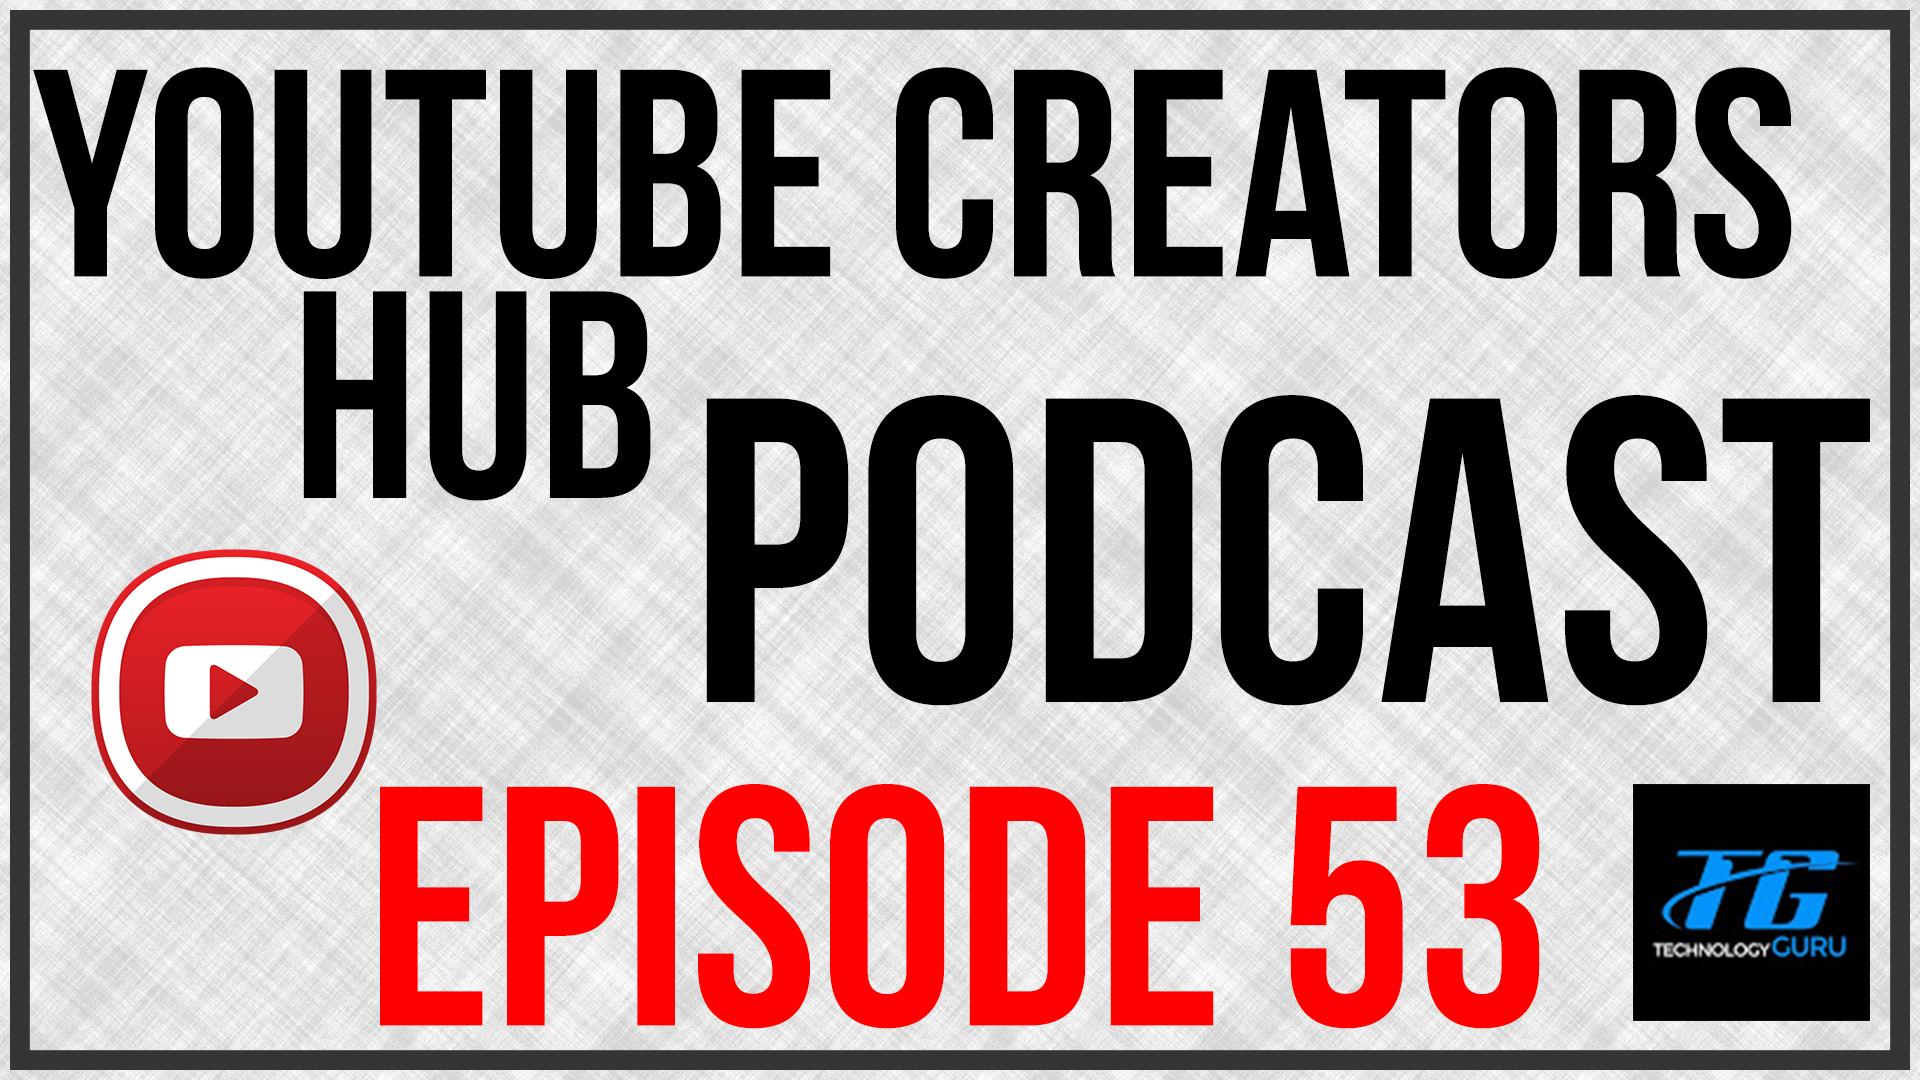 YouTube Creators Hub Podcast Episode 53